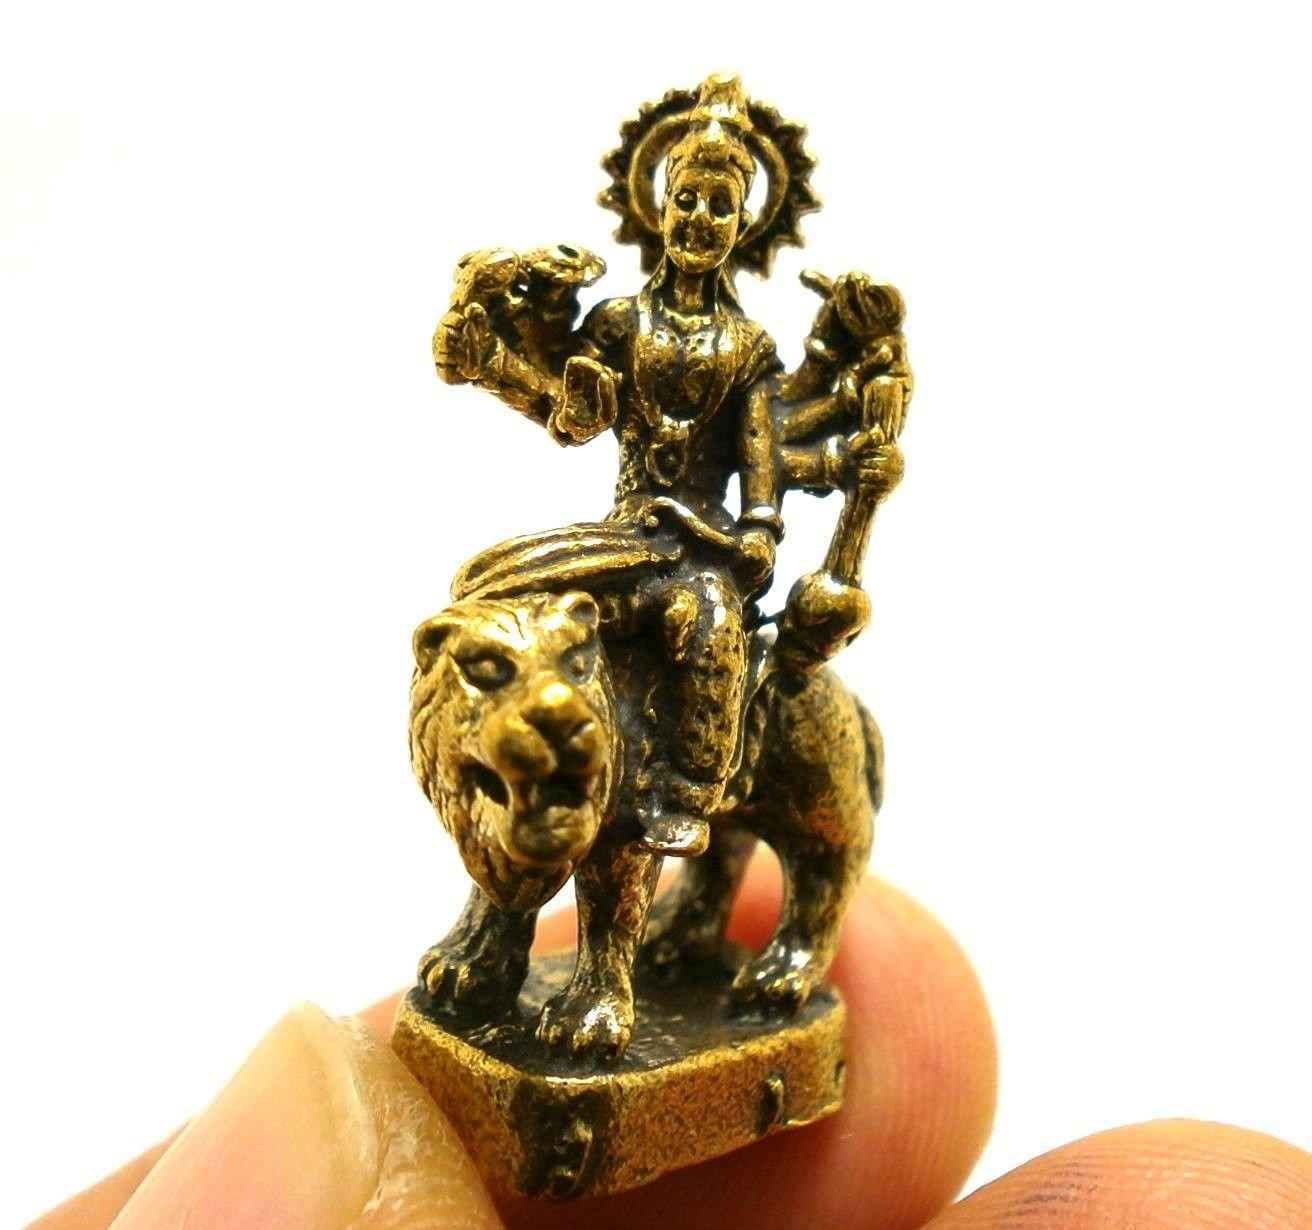 HINDU MINI BRASS AMULET MAA DURGA PARVATI KALI UMA DEVI RIDE LION GODDESS SHAKTI